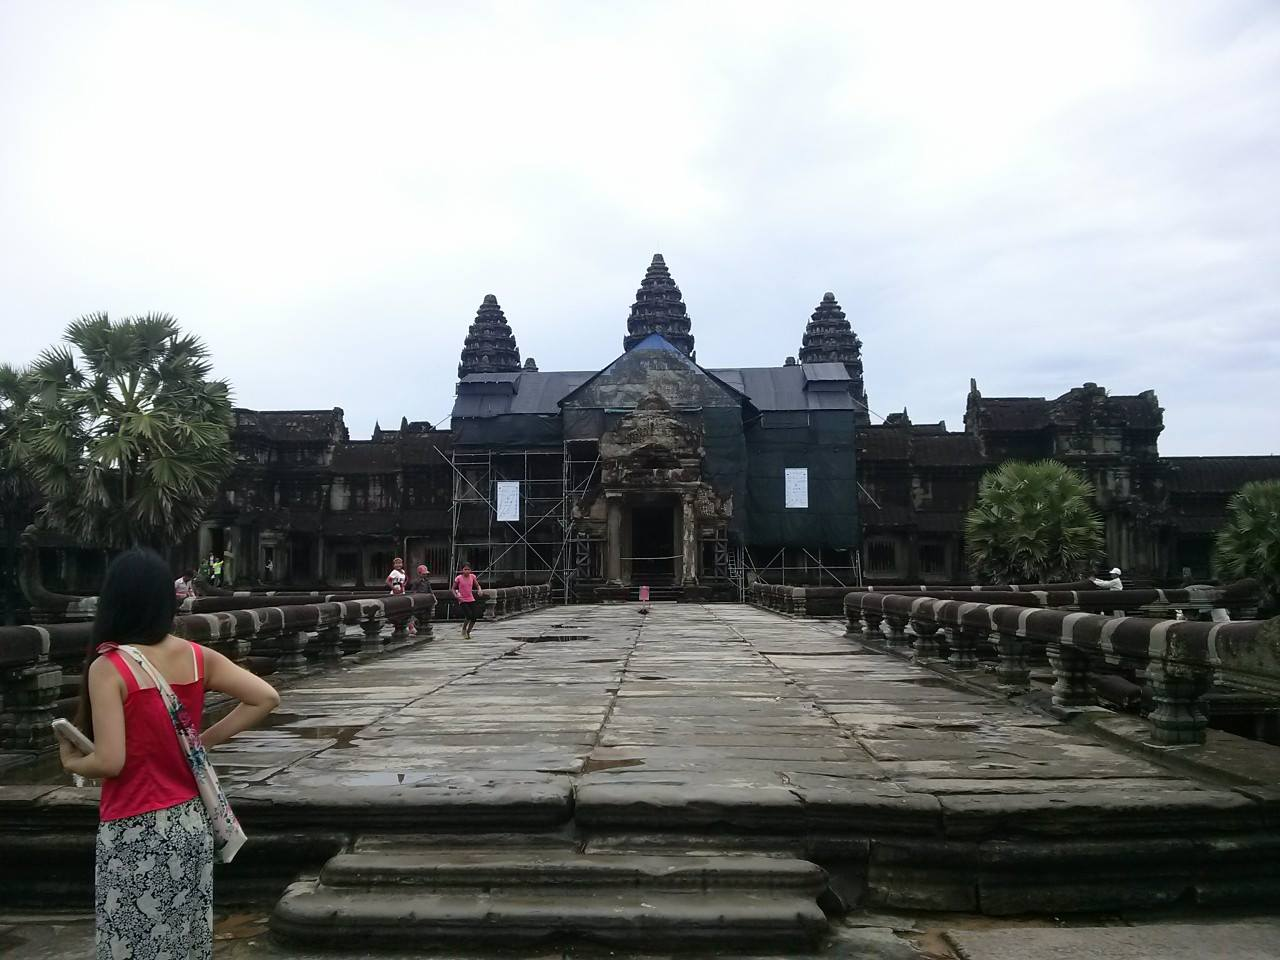 Angkor Wat Undergoing Maintenance